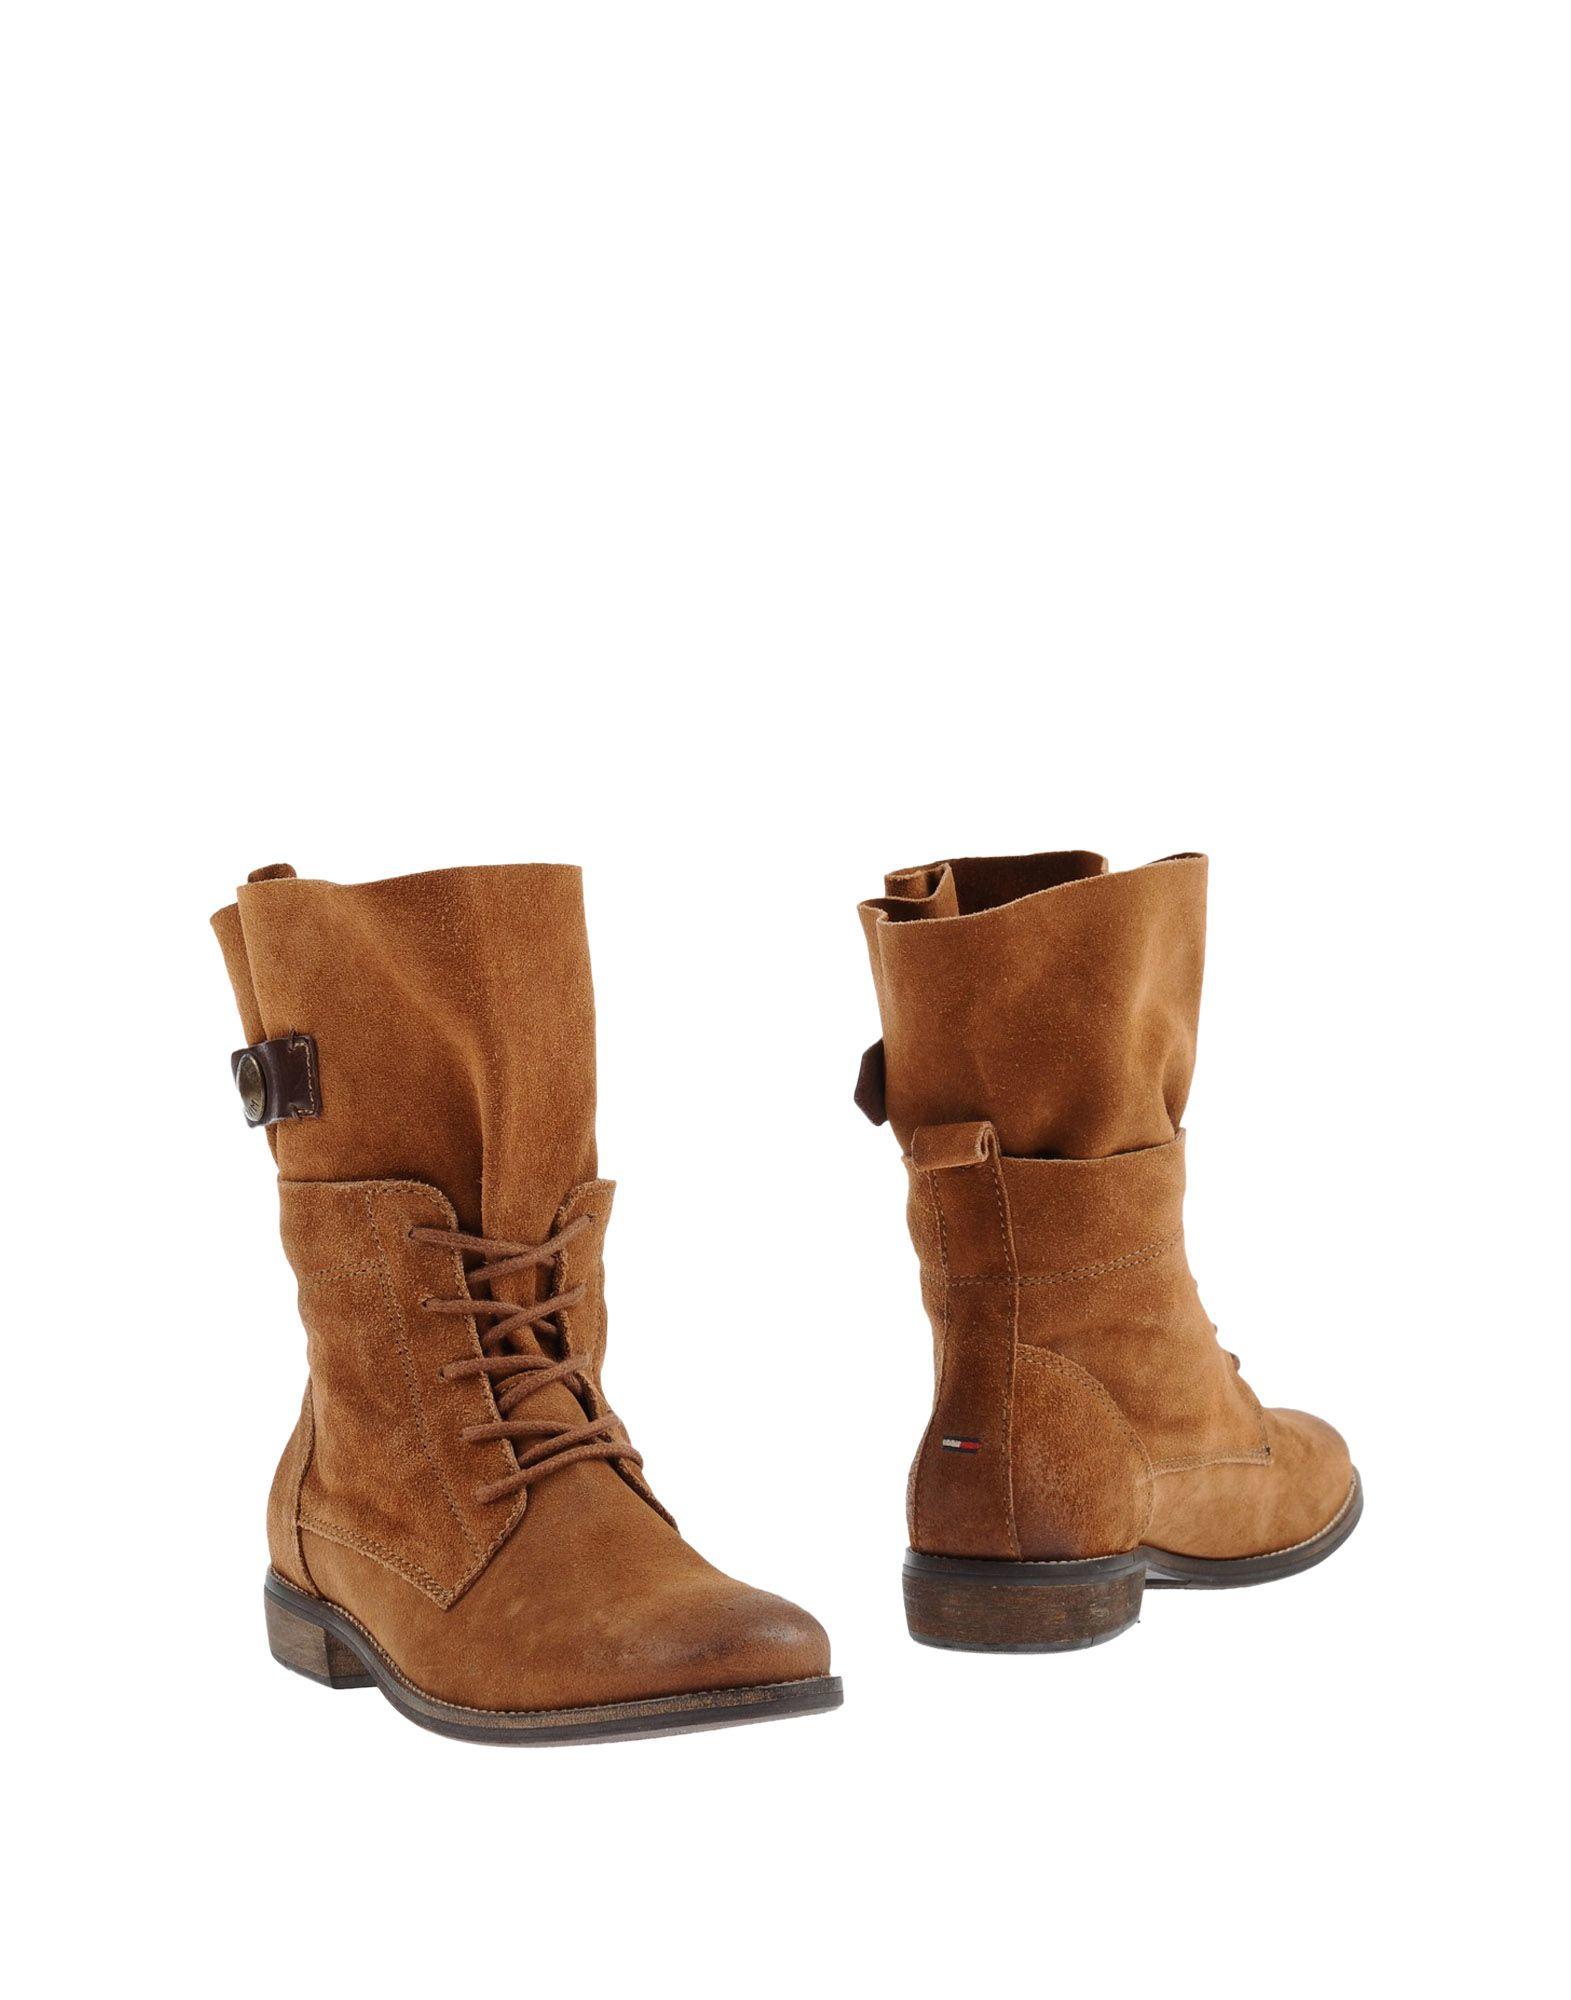 hilfiger denim ankle boots in brown lyst